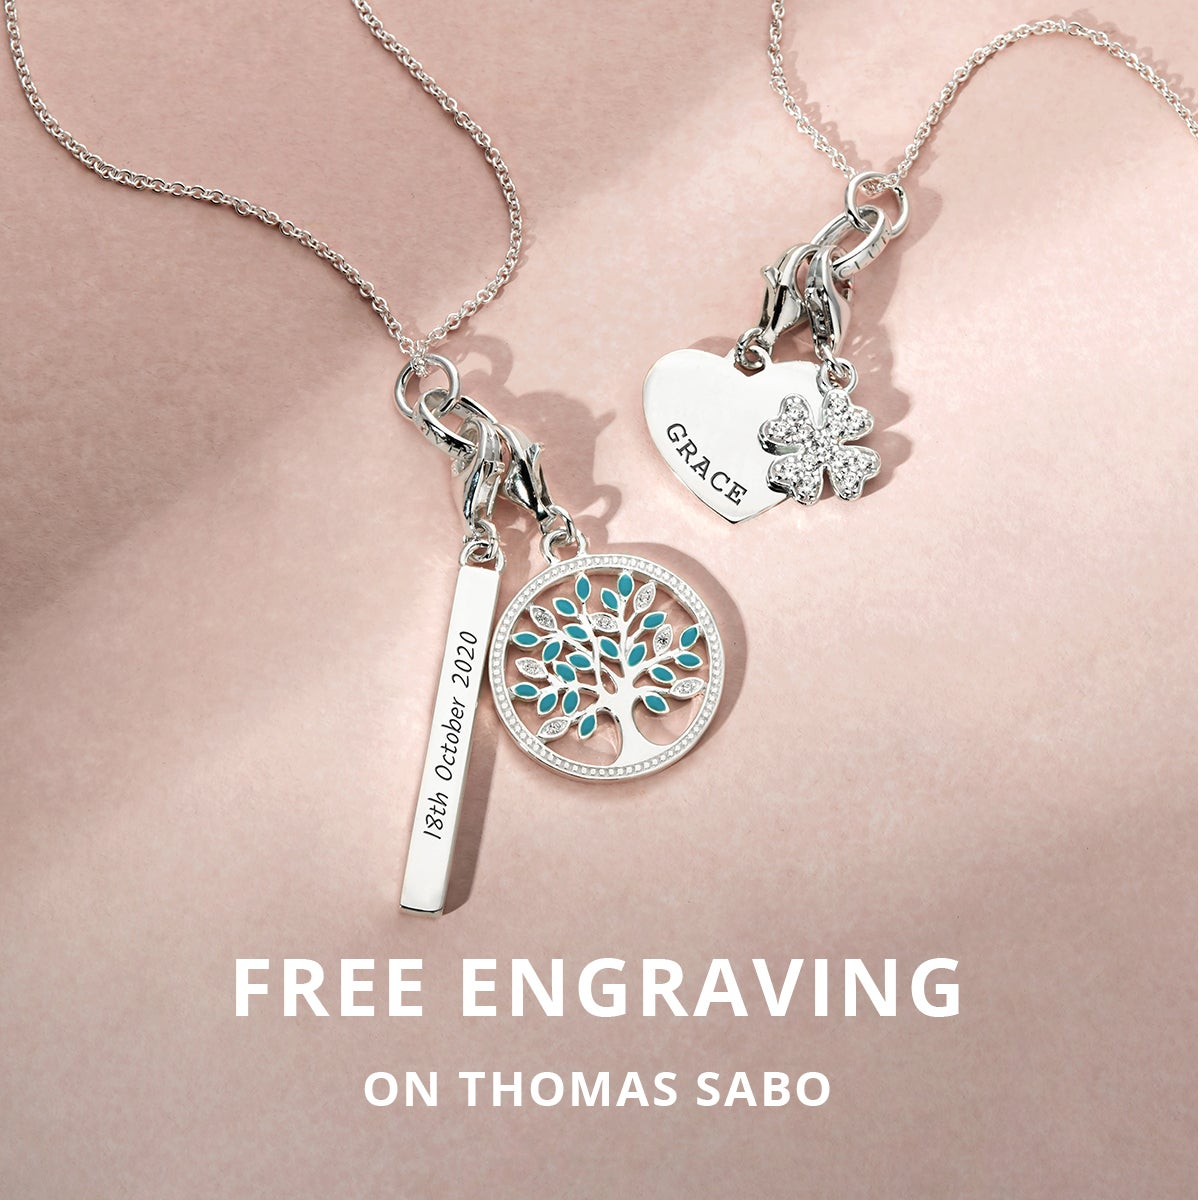 Thomas Sabo Free Engraving